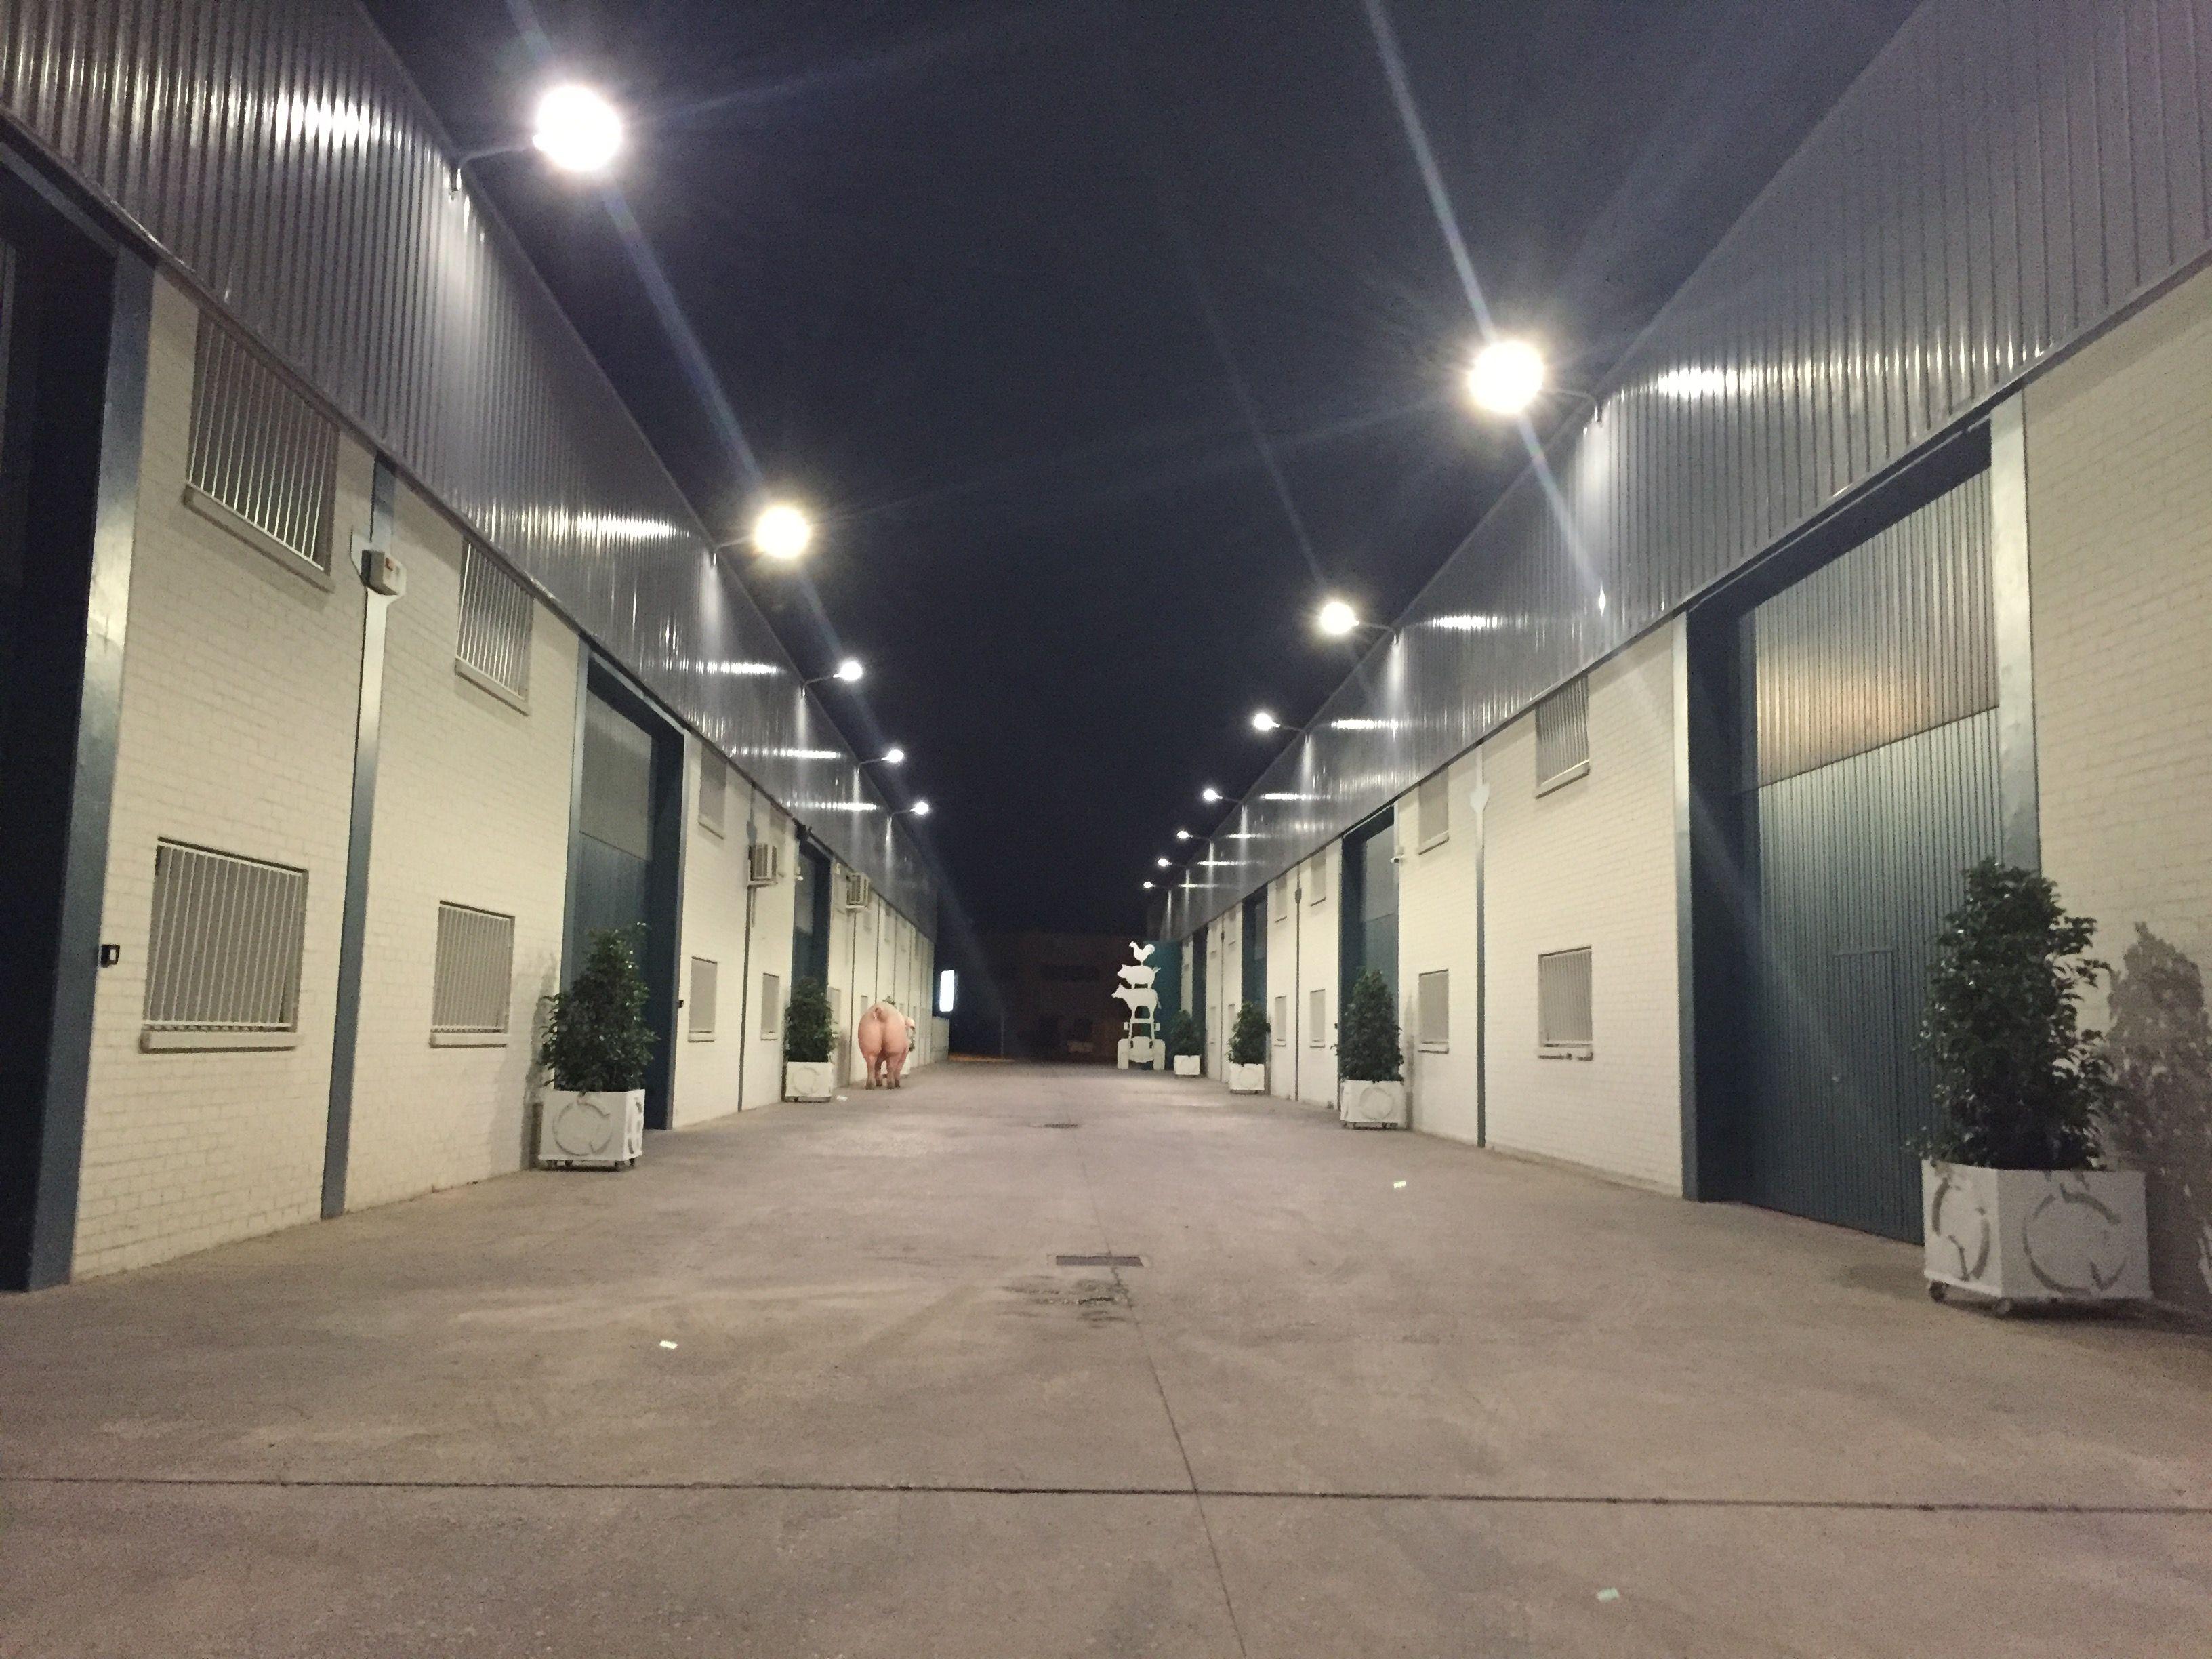 Inaugurada la iluminaci n exterior de agropal agropal - Iluminacion exterior ...